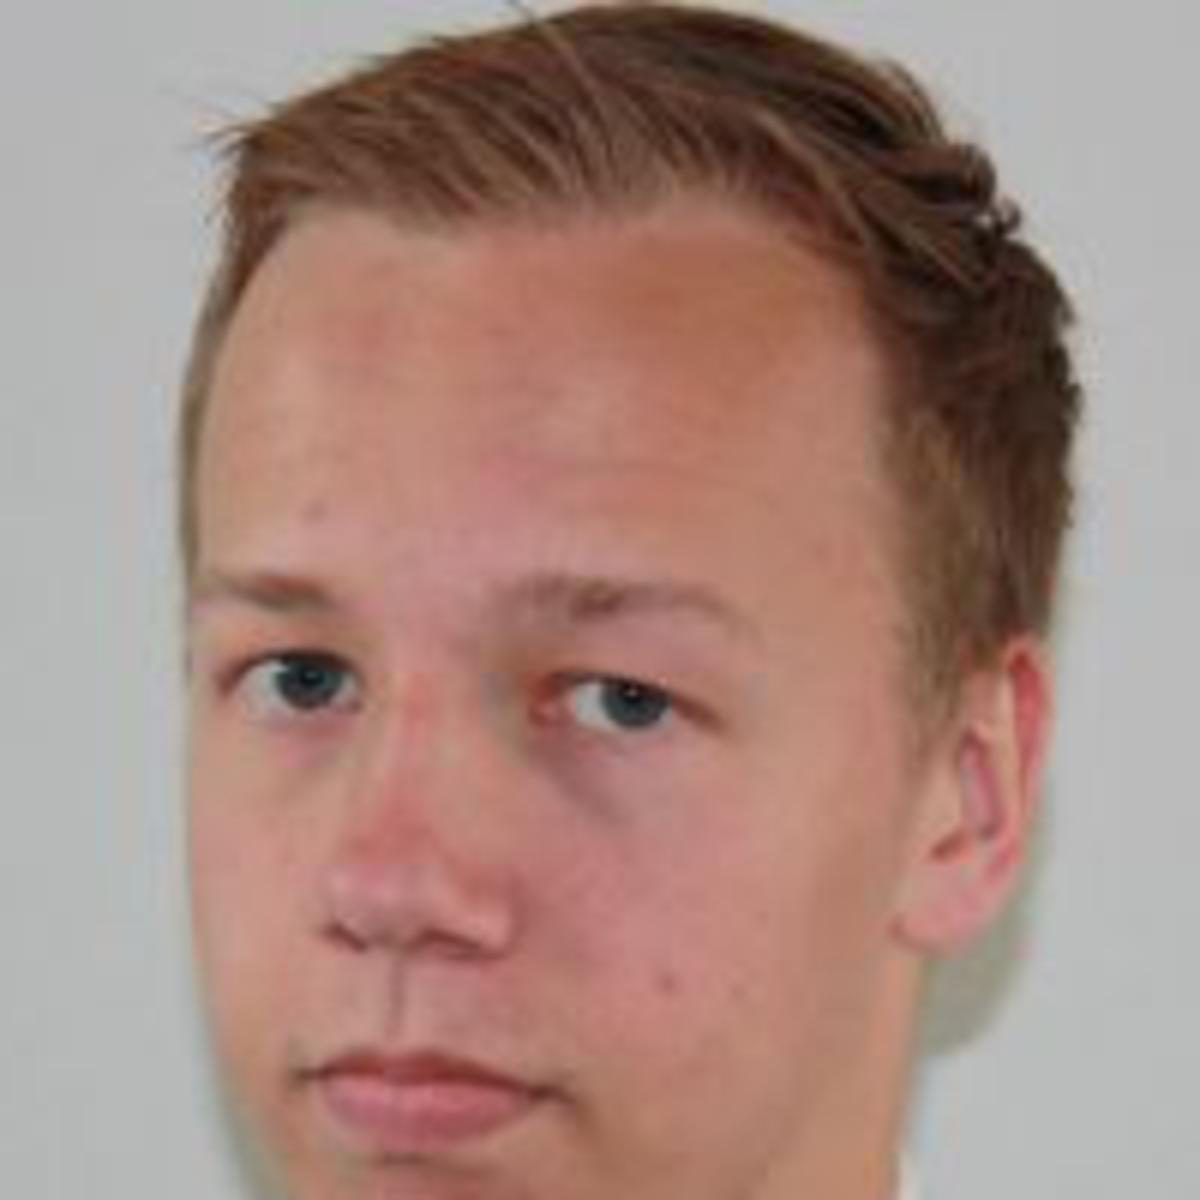 Jonathan_Pedersen1.jpg